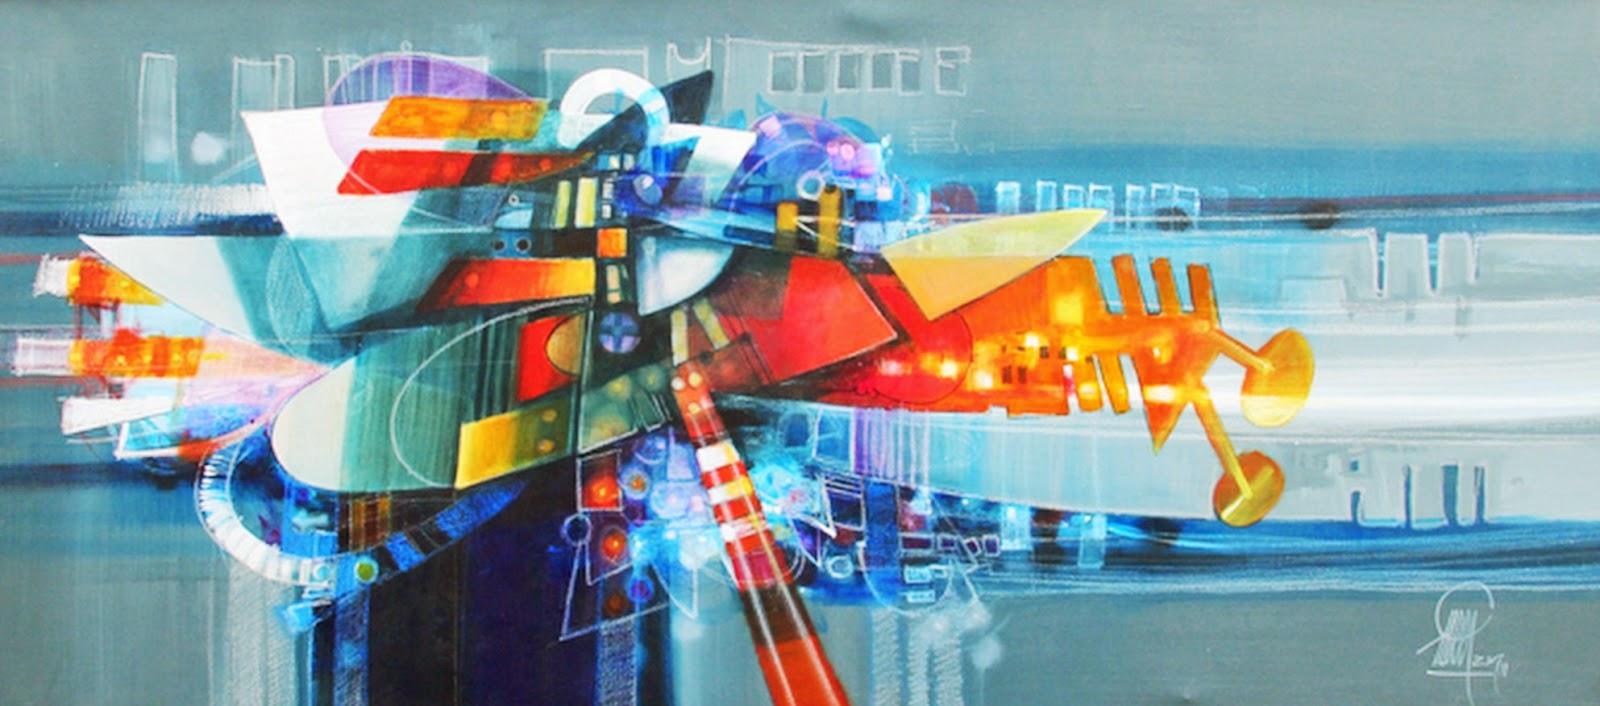 Cuadros pinturas oleos cuadros modernos pintados al leo - Fotos modernas para cuadros ...